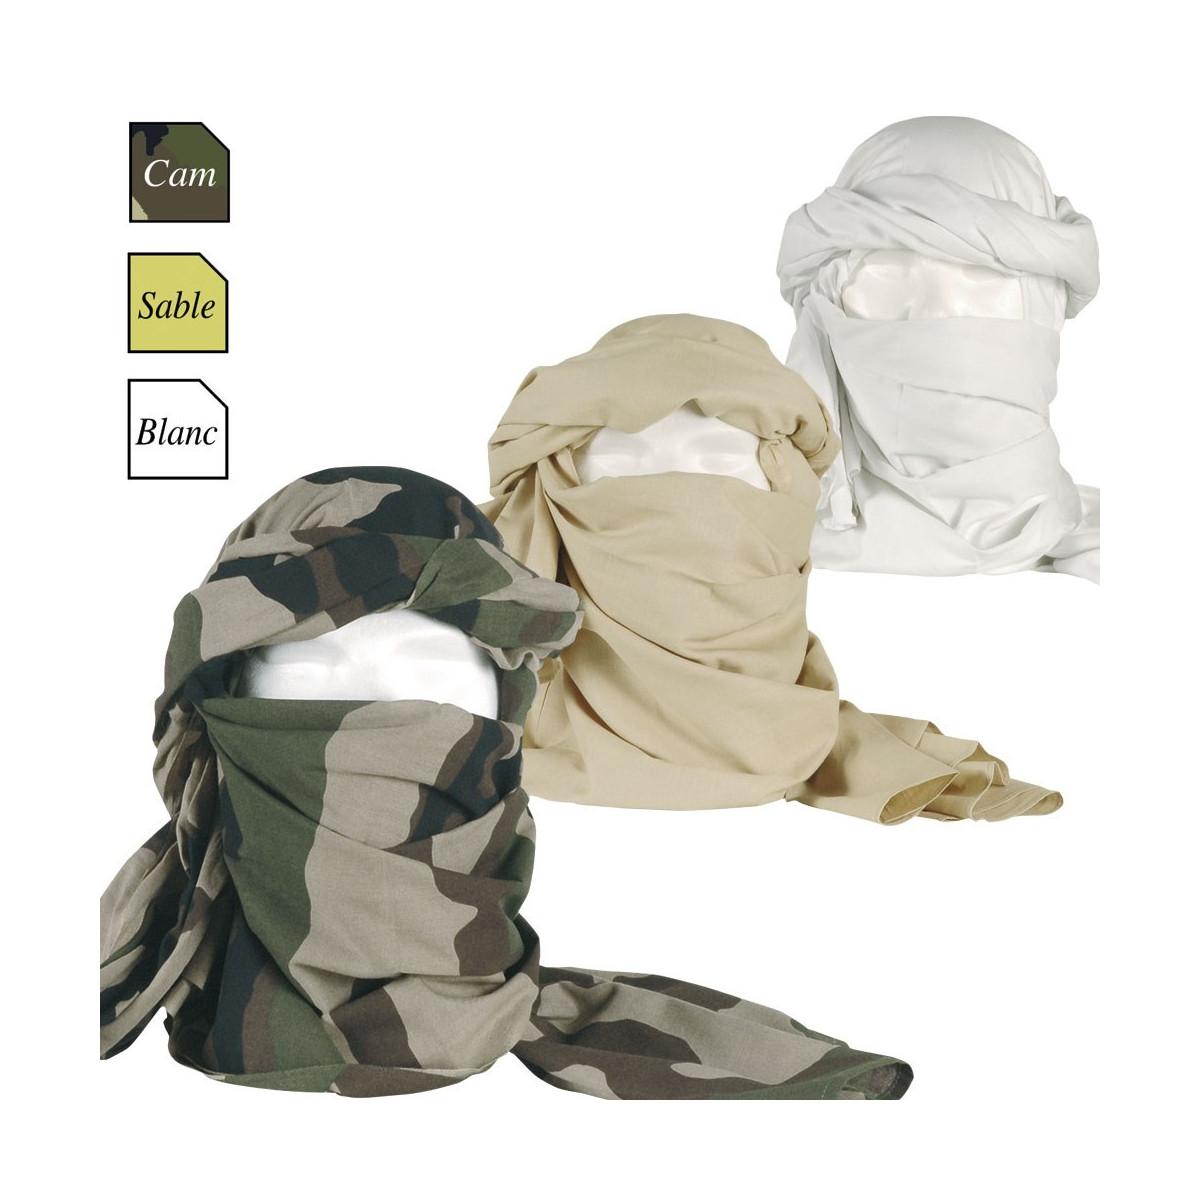 Chèche en coton (blanc, beige, camo CE) f932dd7cef1